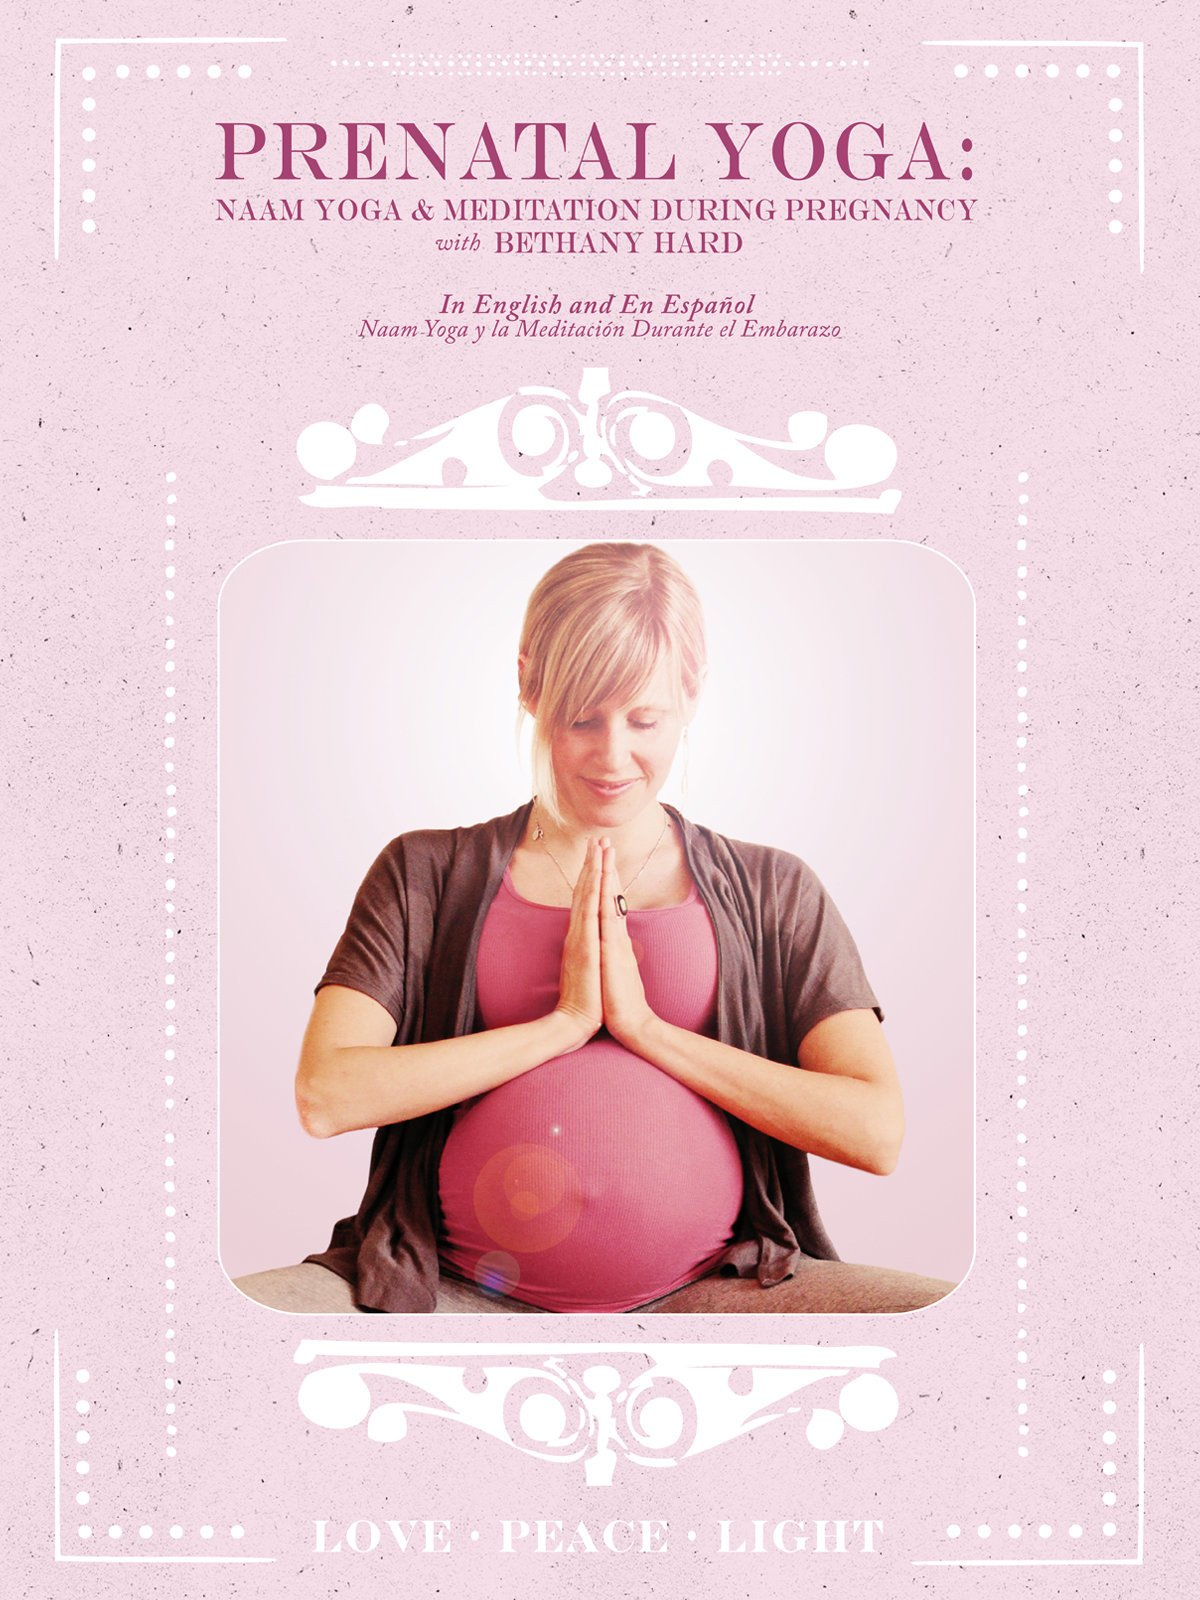 Amazon.com: Prenatal Yoga: Naam Yoga during Pregnancy with ...